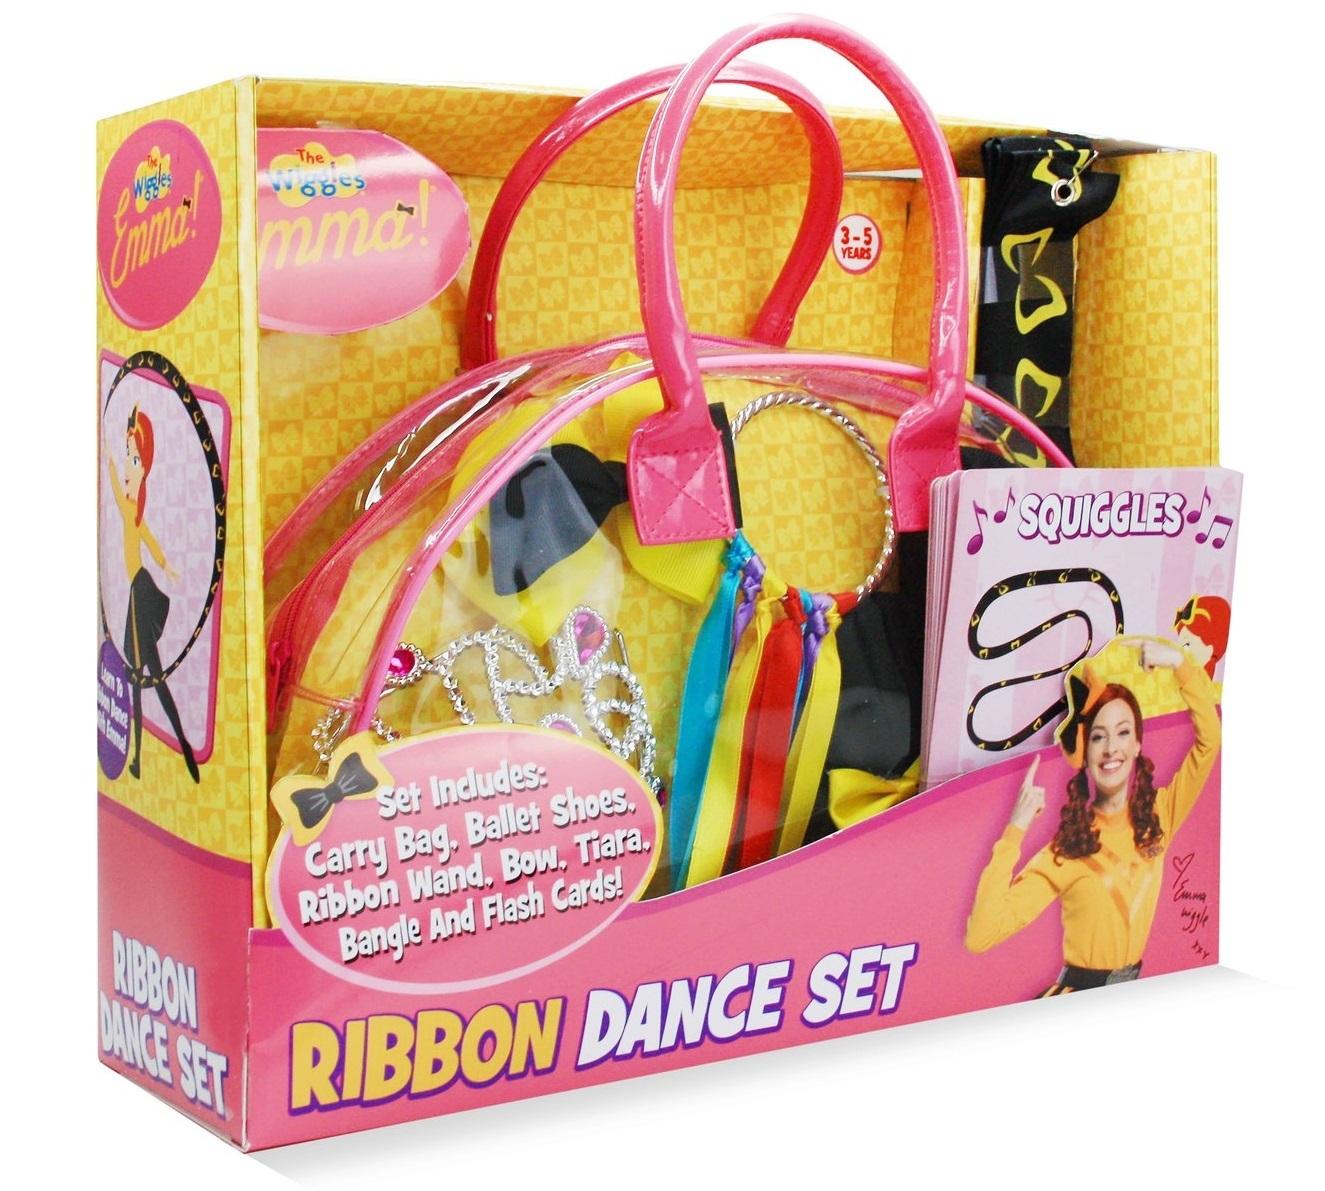 The Wiggles: Emma's Ribbon Dance Set image